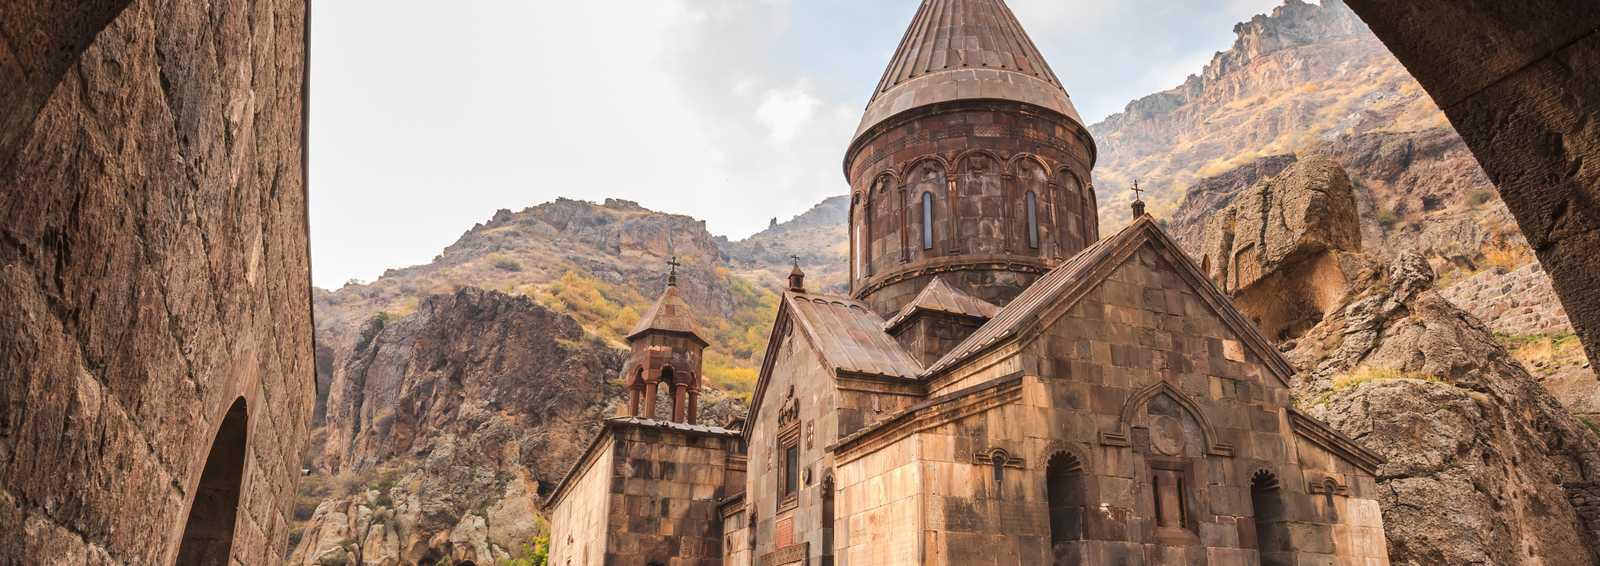 Orthodox Christian monastery, Kotayk